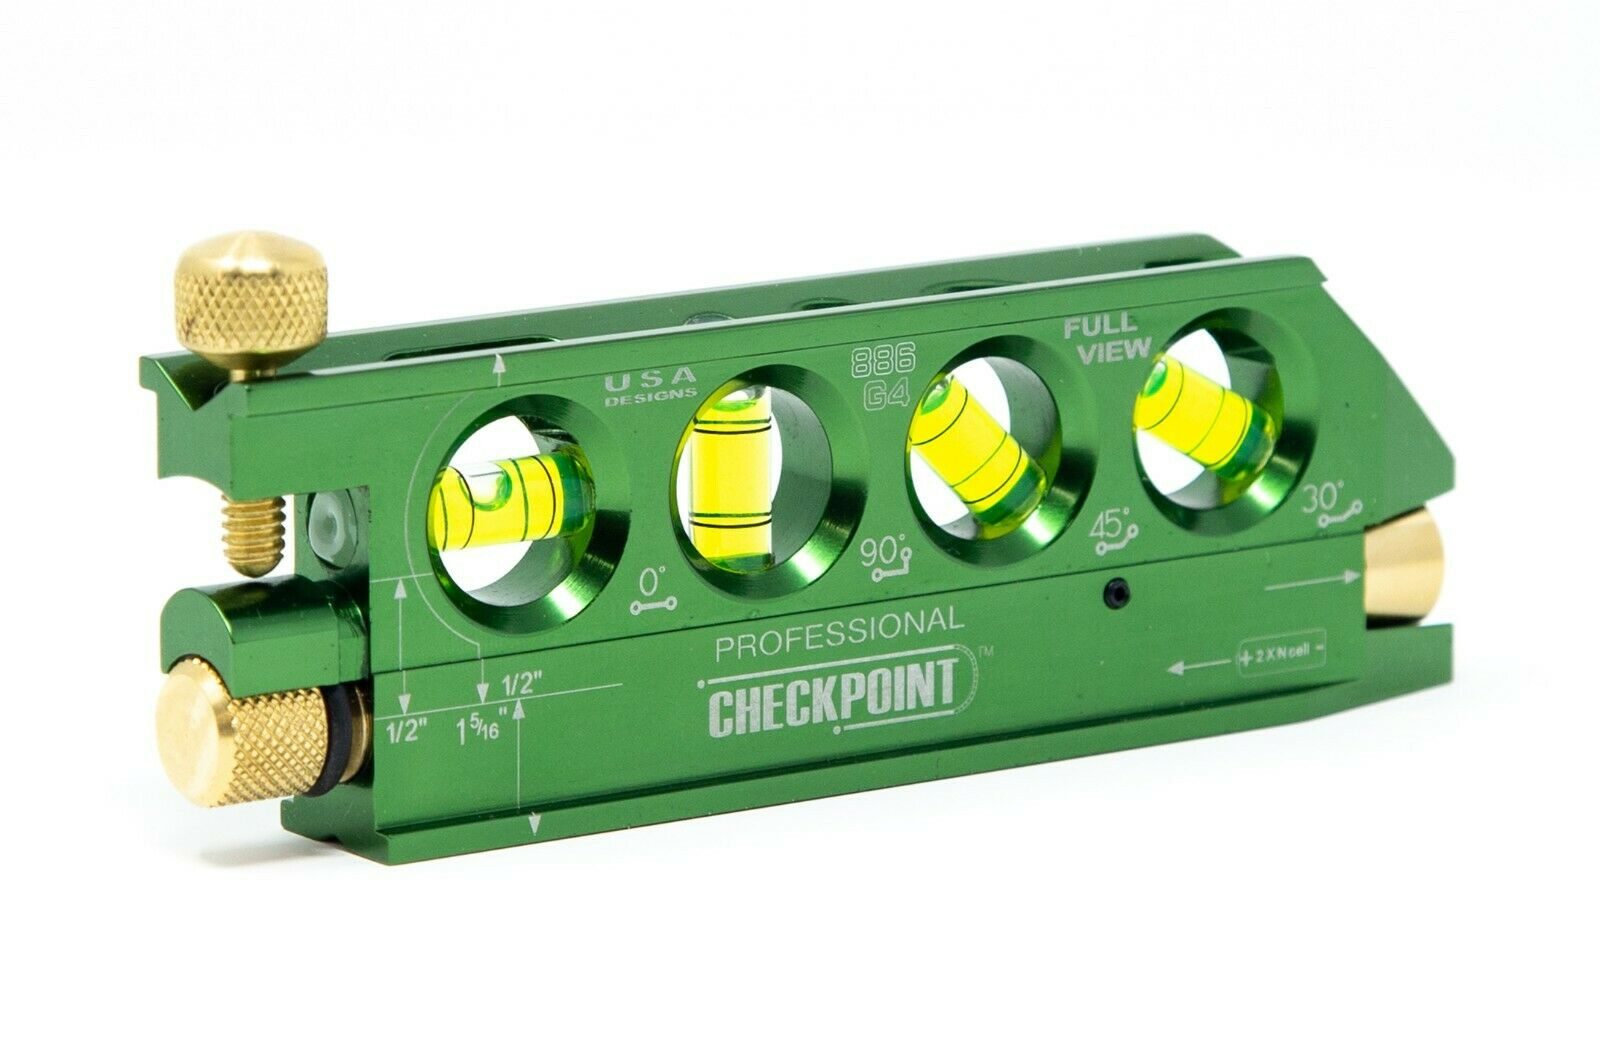 #0300PL Checkpoint Ultra Mag G3 Level Platinum